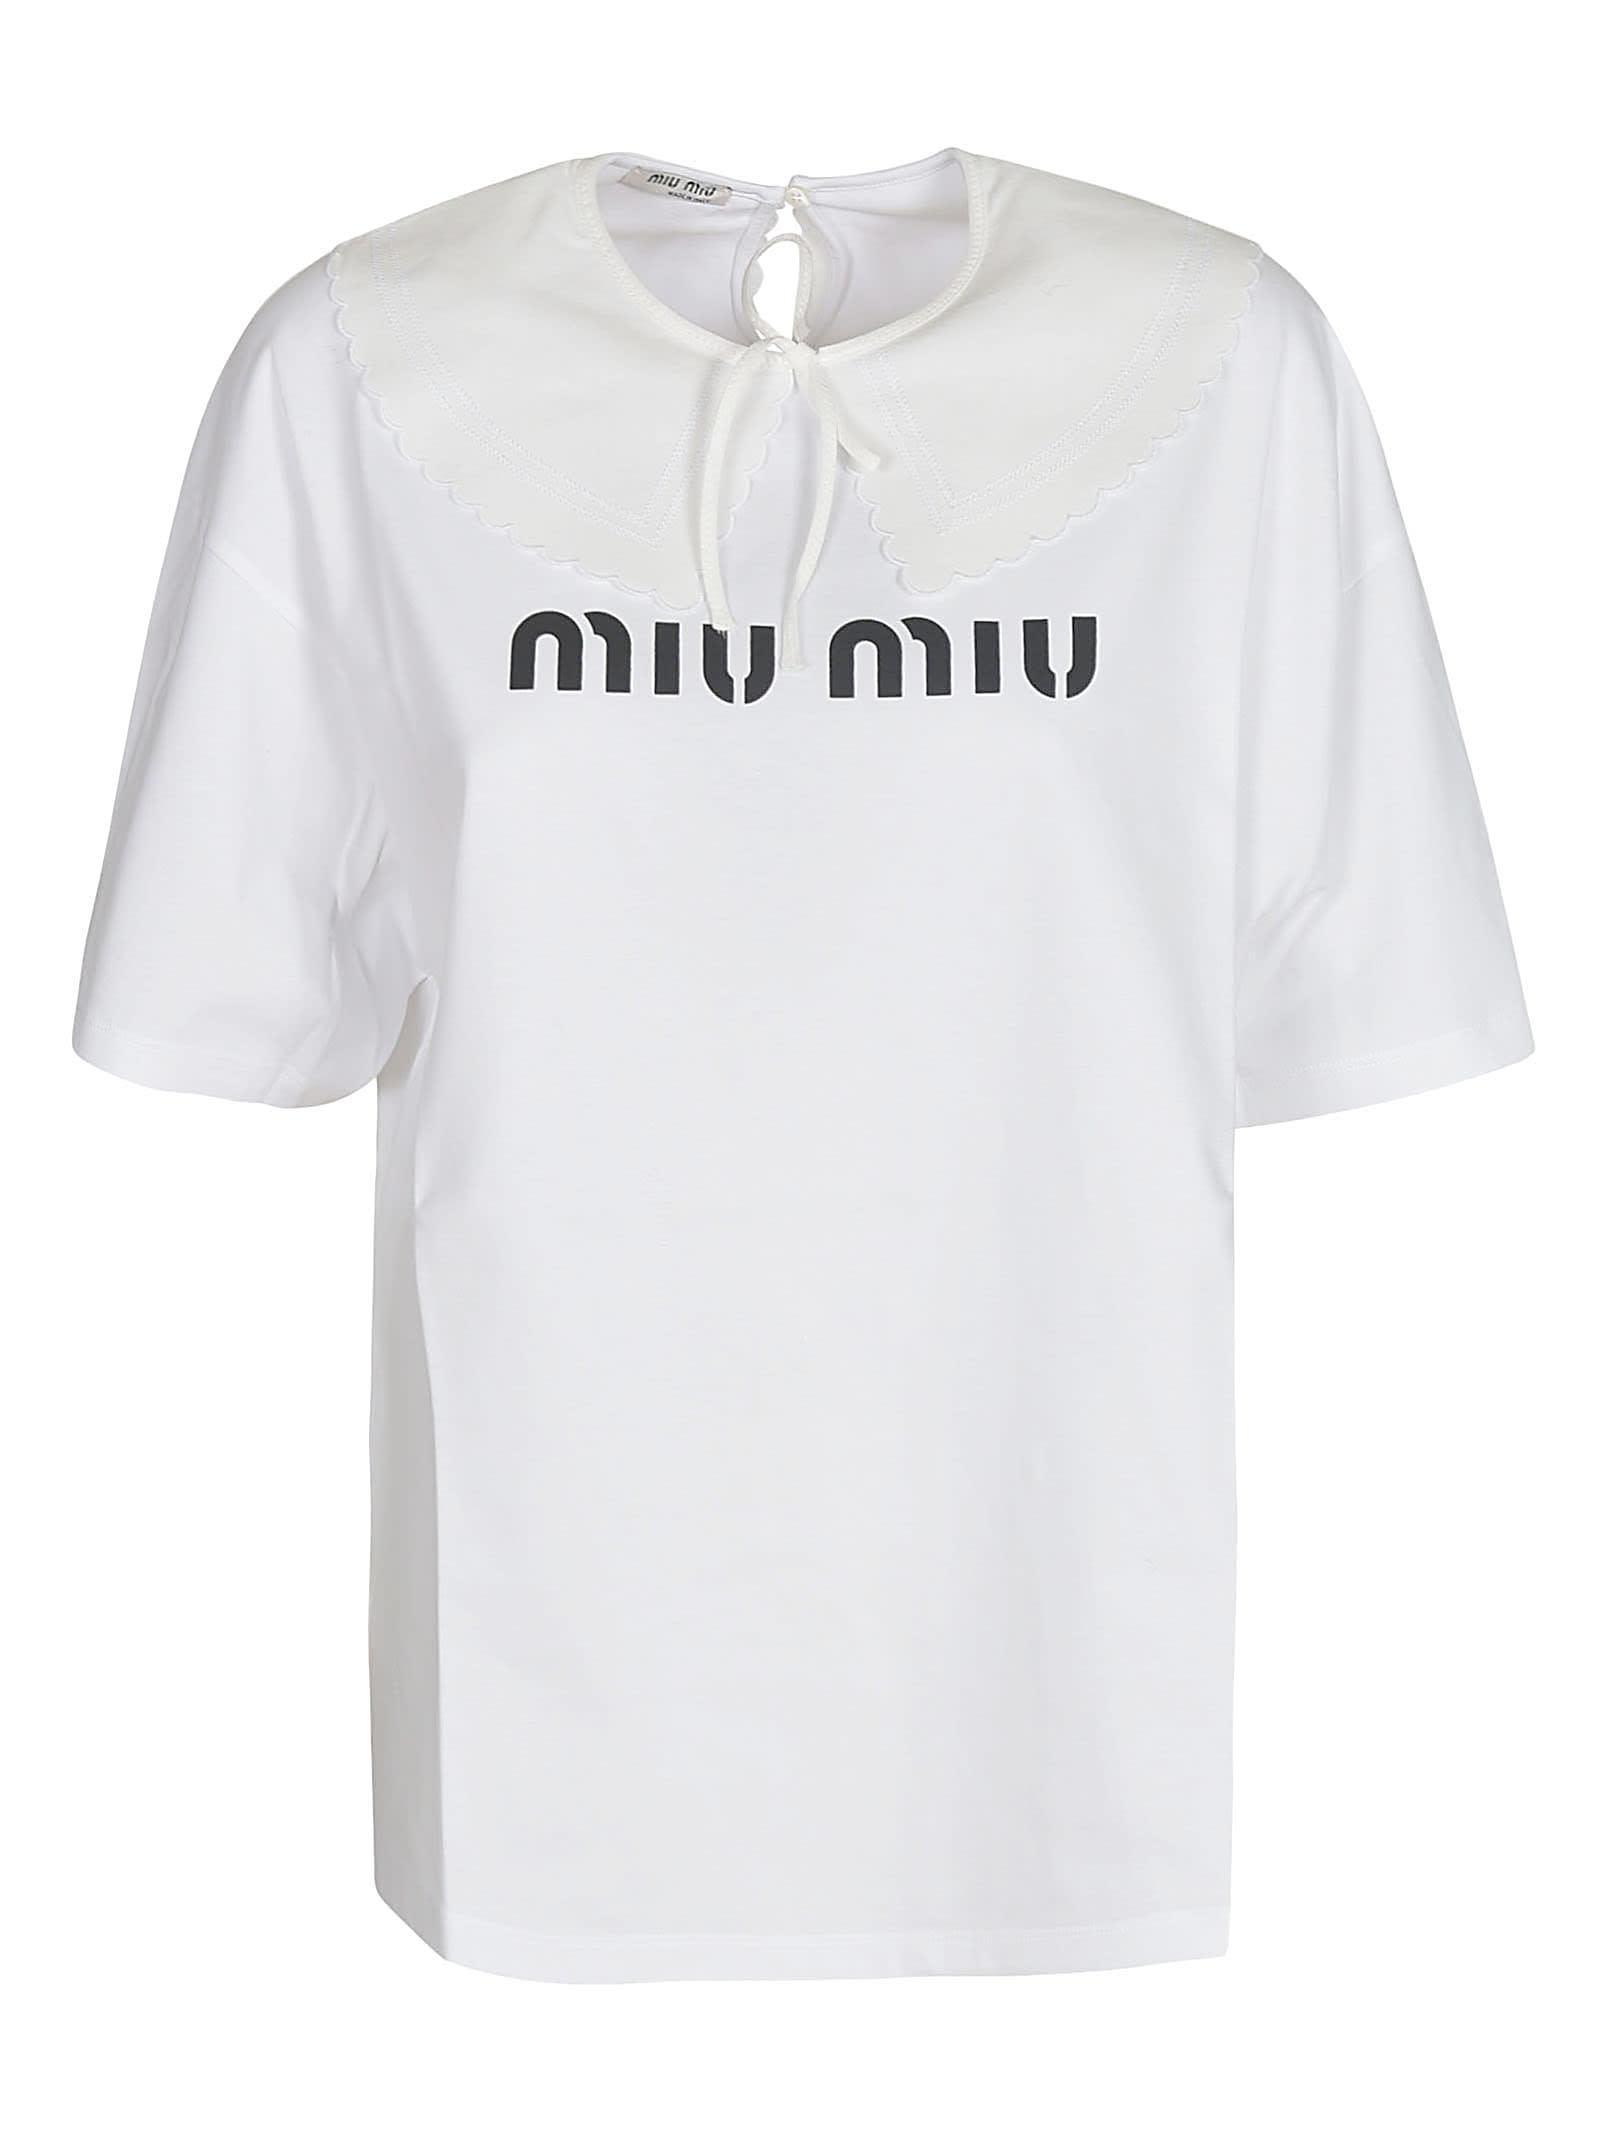 Miu Miu LOGO PRINTED T-SHIRT